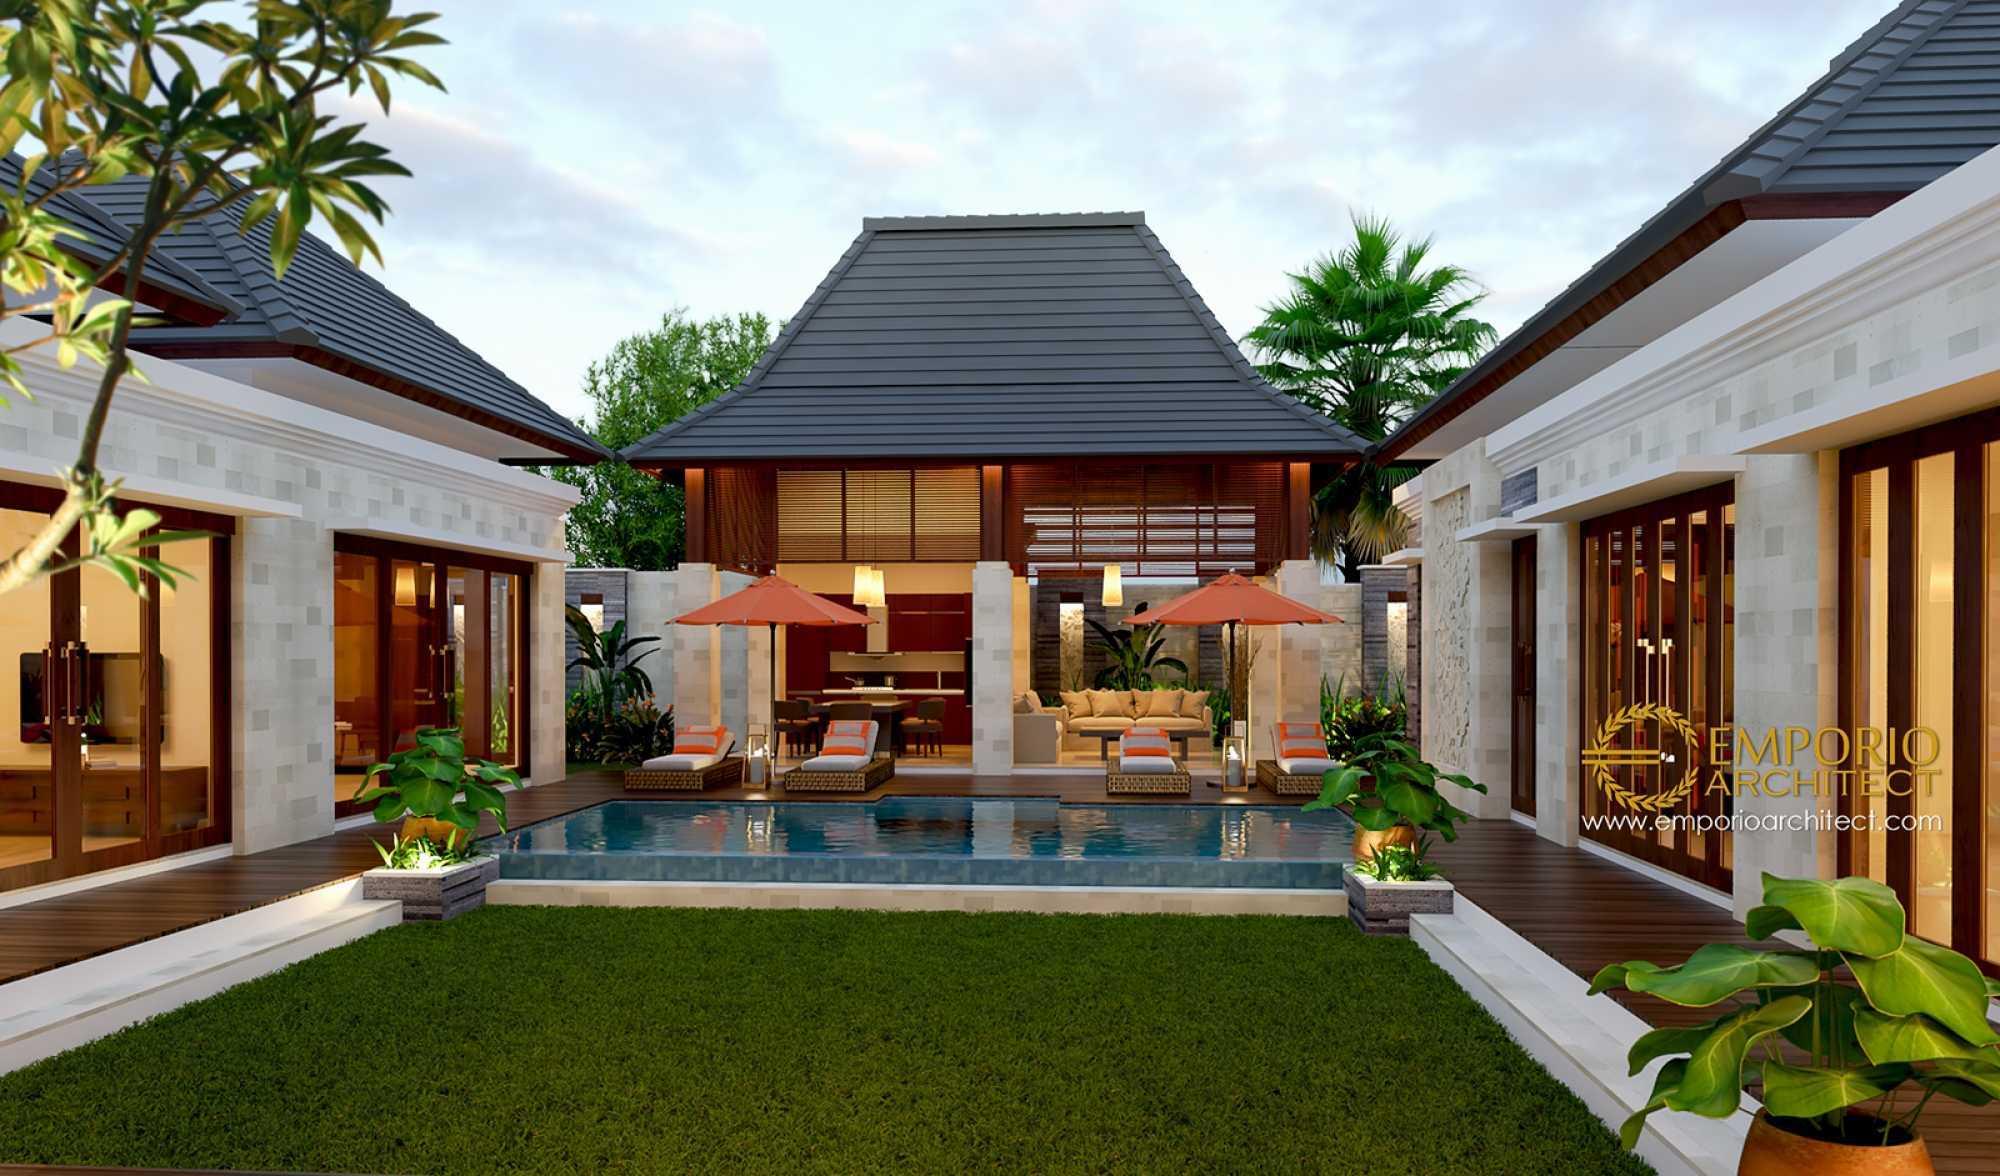 Emporio Architect Desain Rumah Villa Bali Tropis 405 @ Maluku Maluku, Indonesia Maluku, Indonesia Emporio-Architect-Desain-Rumah-Villa-Bali-Tropis-405-Maluku  77228